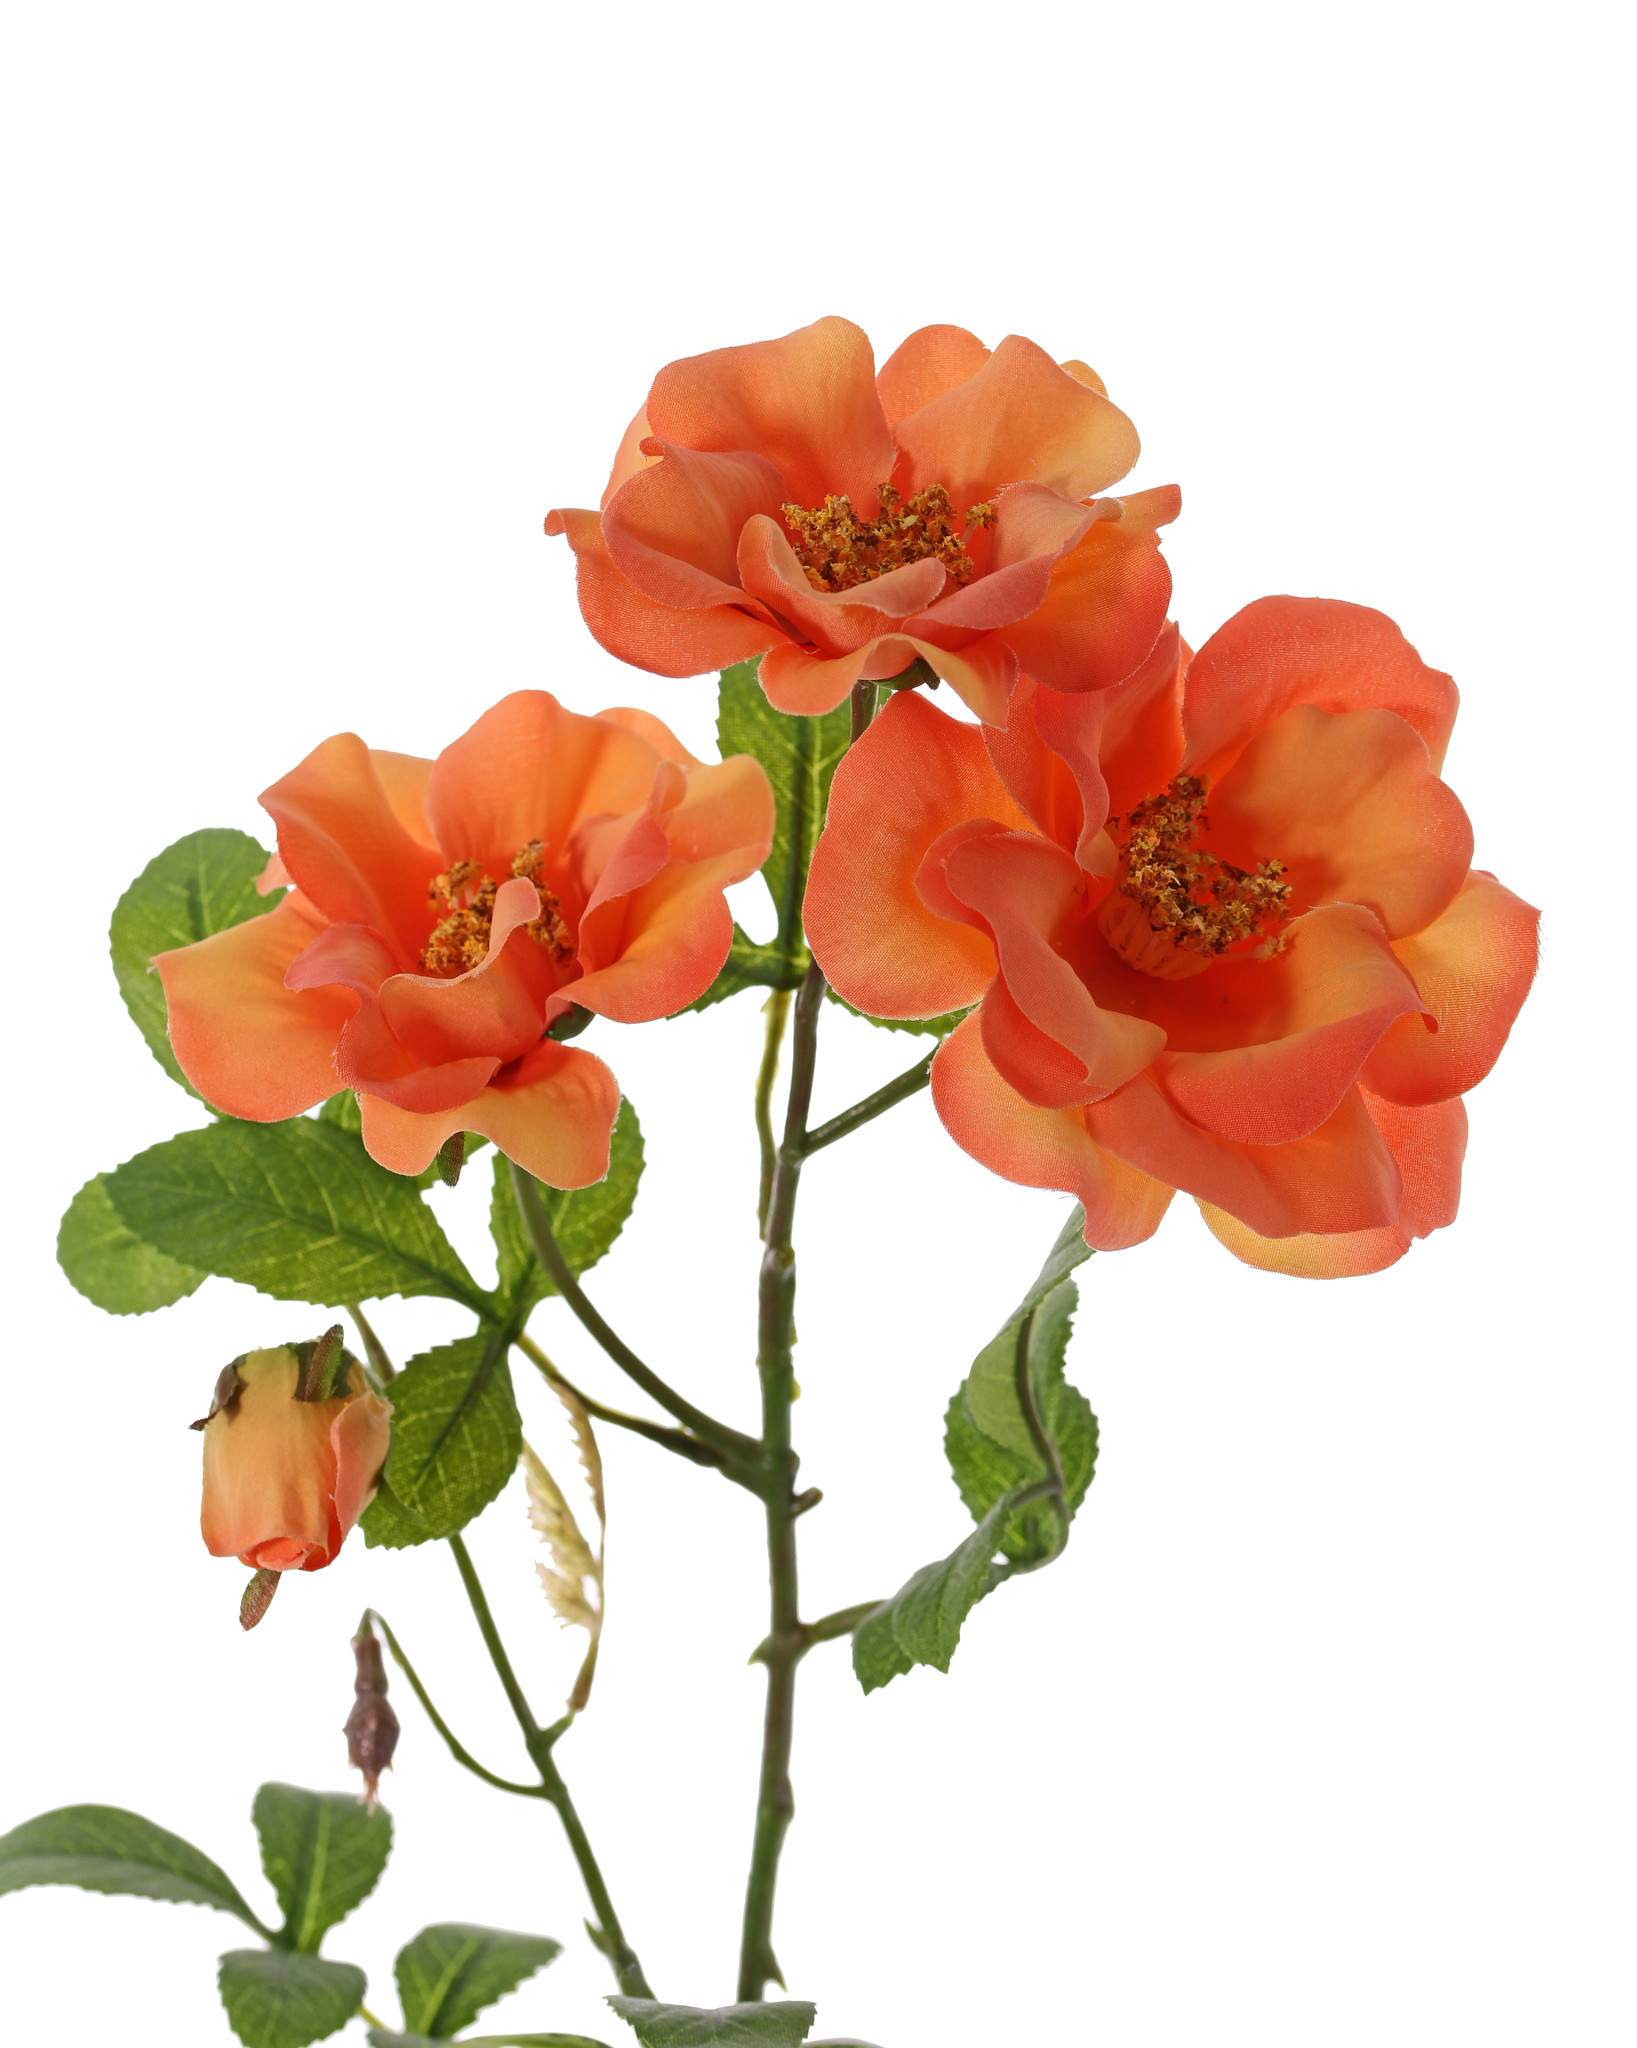 Wilde roos (Rosa rubiginosa), 3 bloemen (2x Ø 9cm, 1x Ø 7cm) & 1 knop, 24 blad (6 sets), 60cm